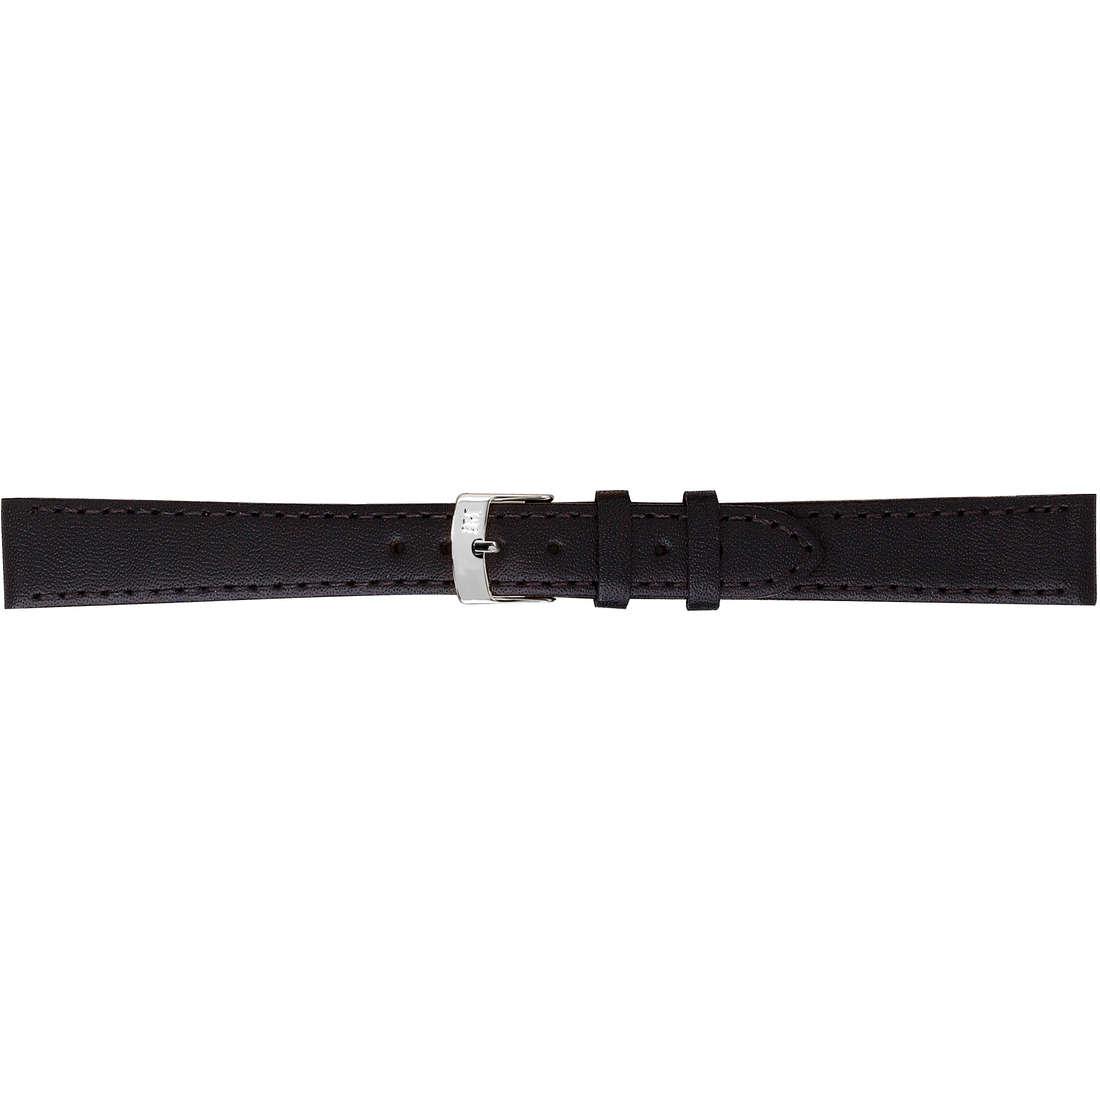 watch watch bands watch straps man Morellato Performance A01X2619875019CR20